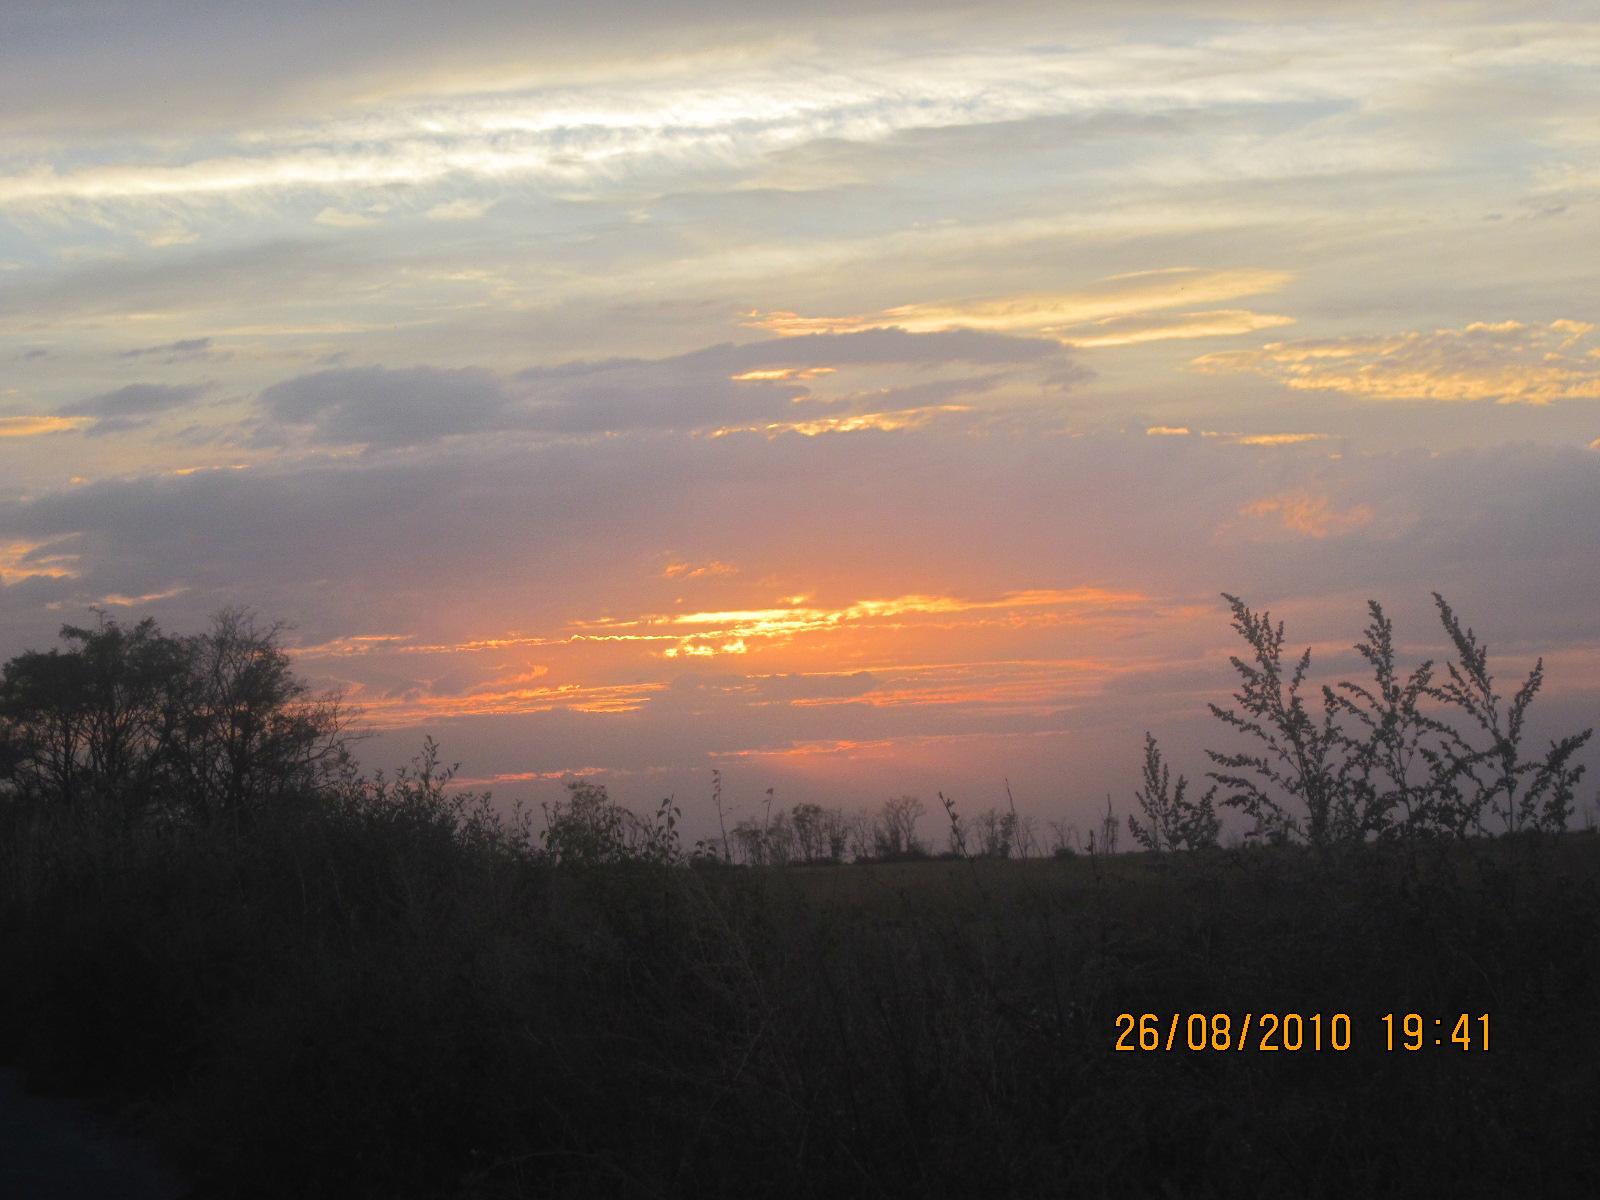 Краденое солнце  (вечер, Волгоград). Блиц: небо